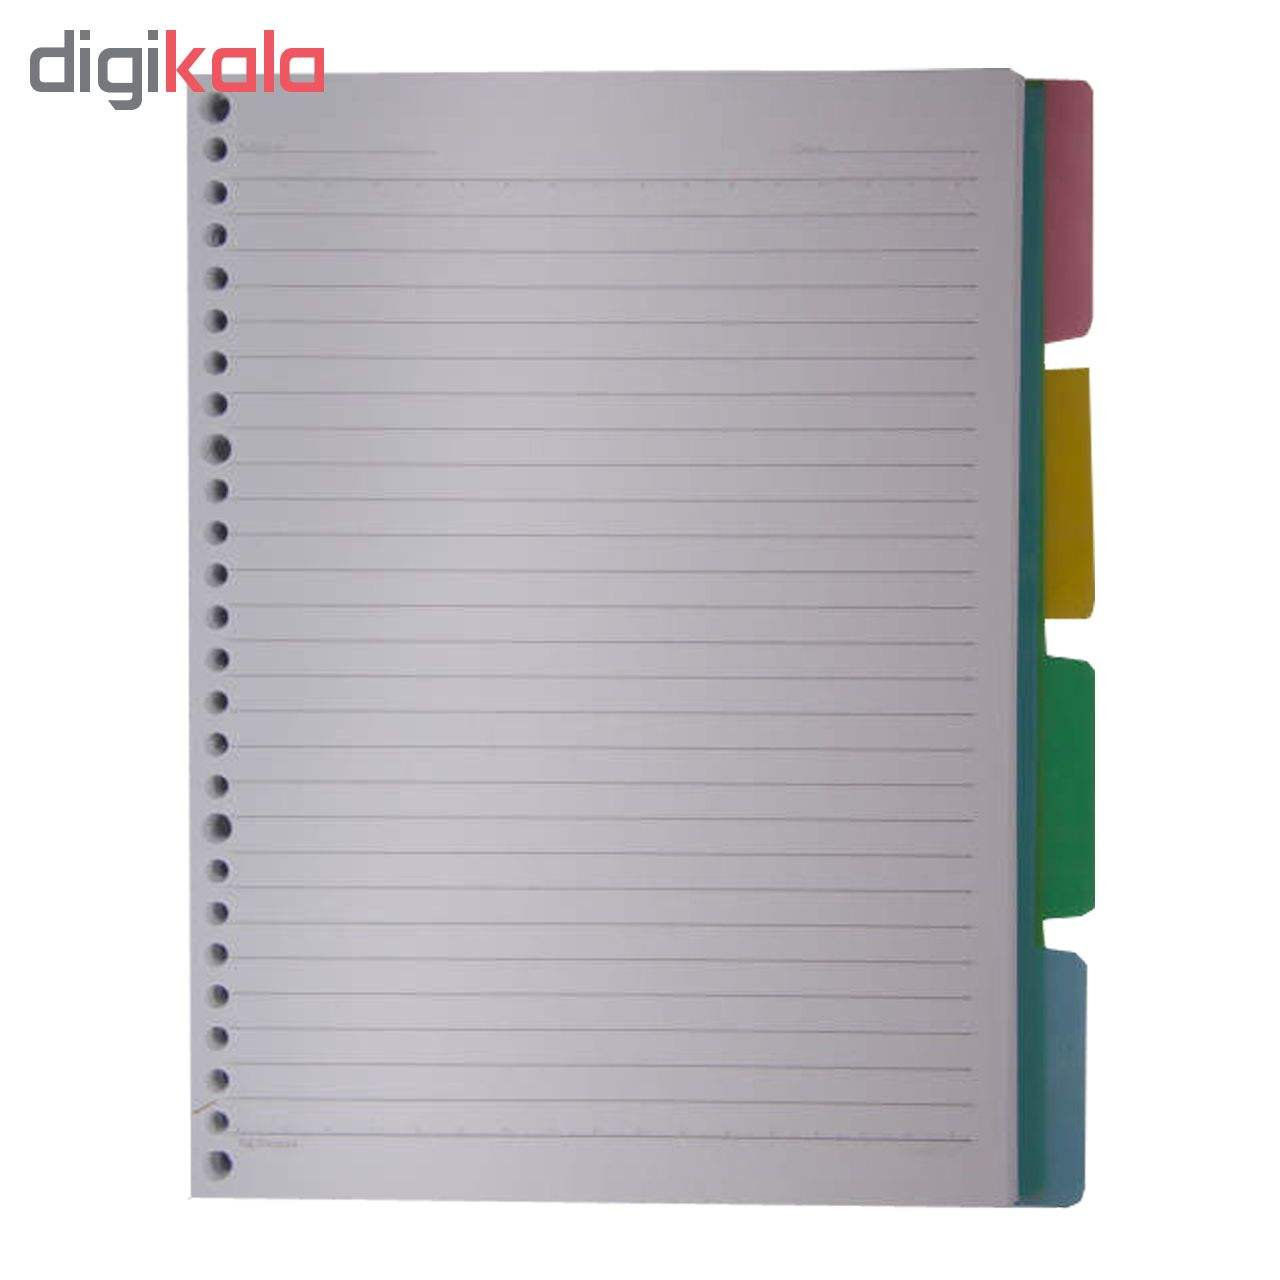 کاغذ کلاسور کد 115 بسته 100 عددی main 1 2